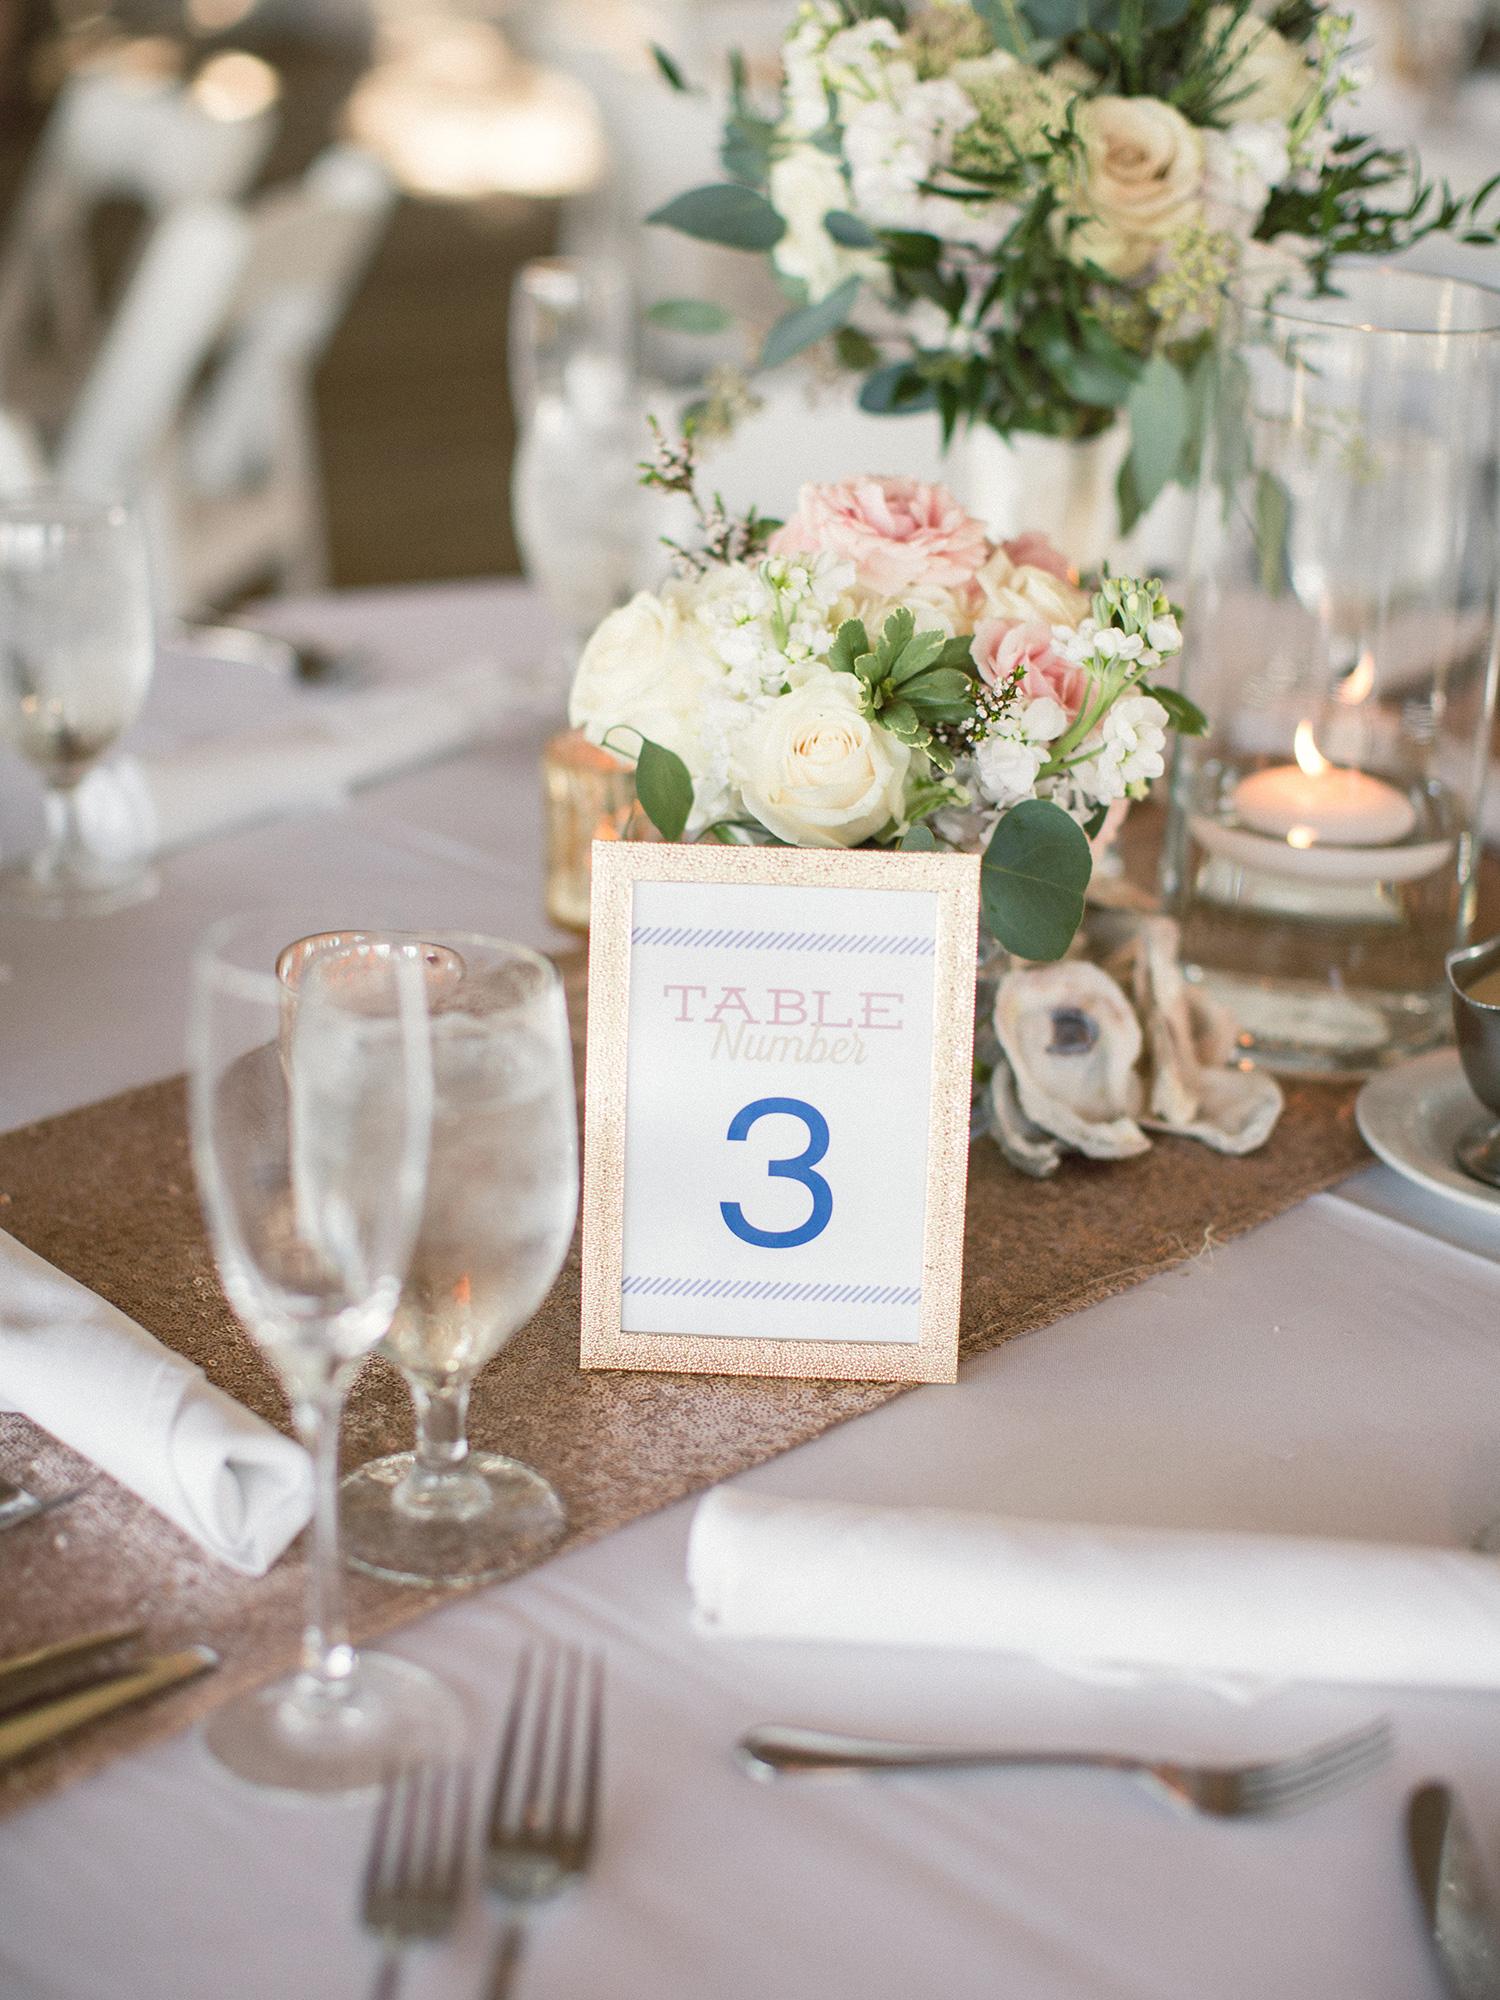 EverElla_Wedding_Beach_Table.jpg